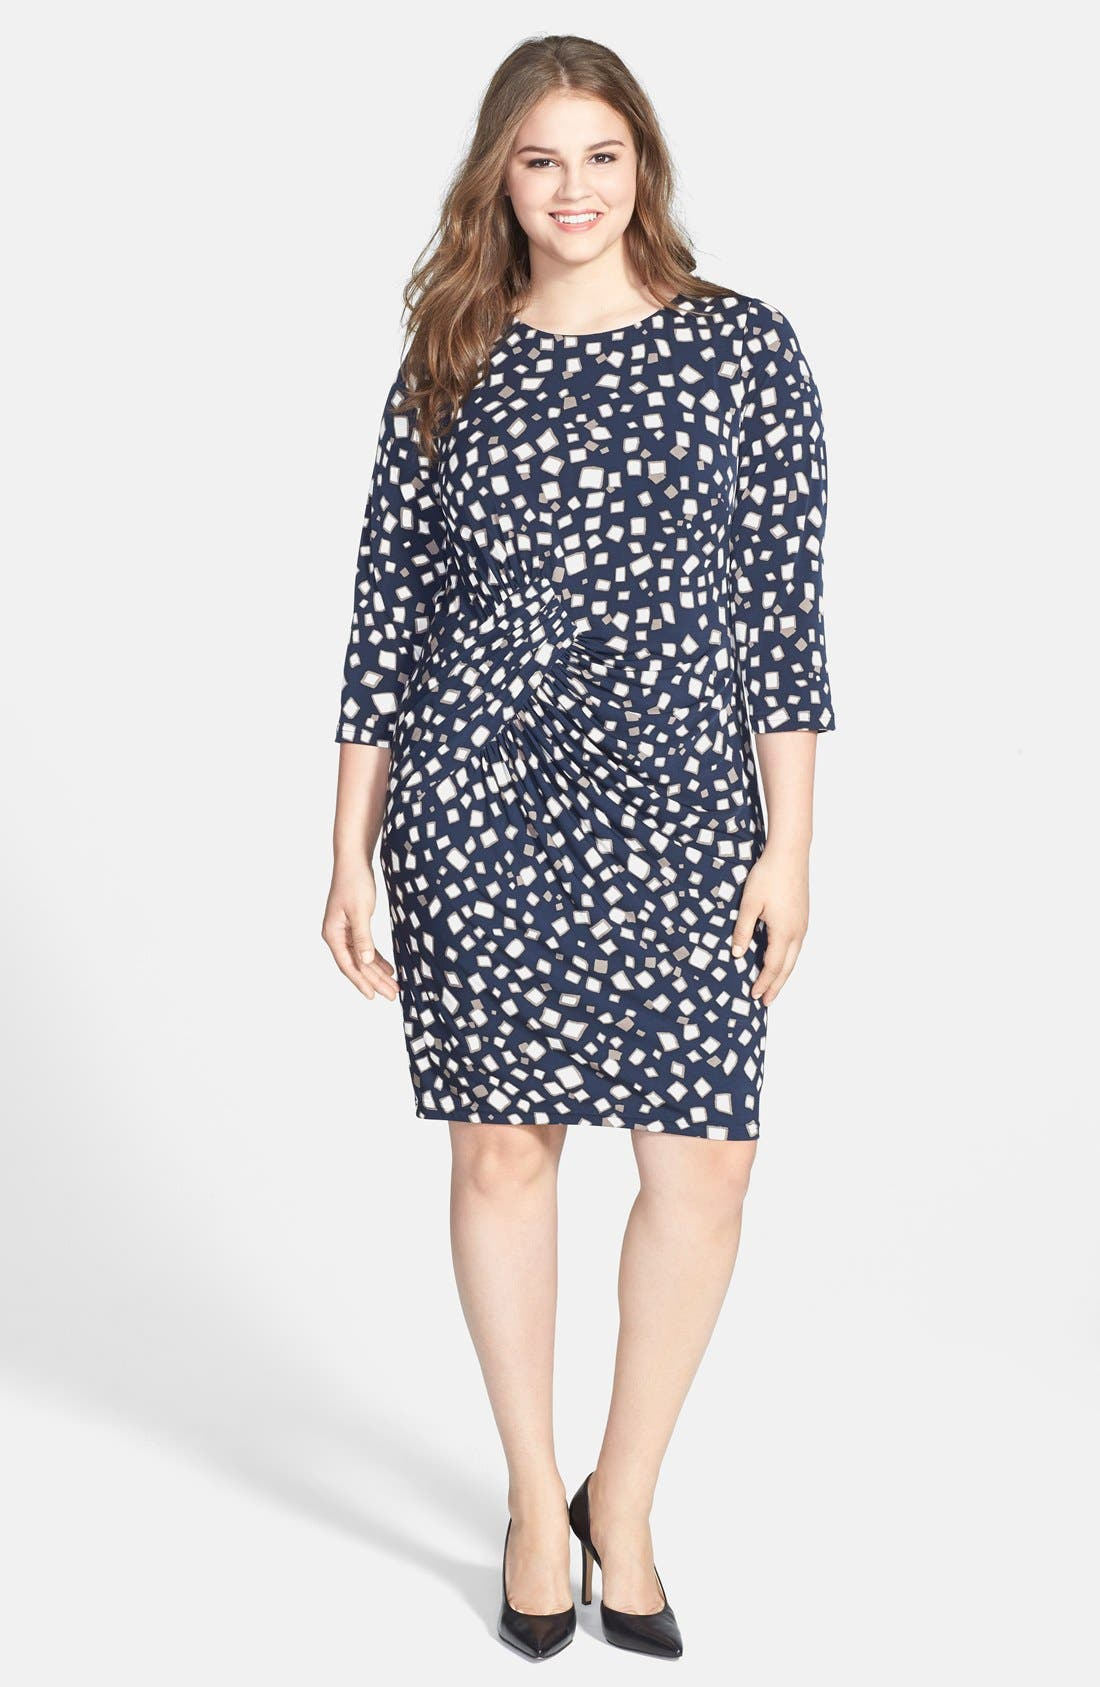 Alternate Image 1 Selected - Adrianna Papell Drape Detail Sheath Dress (Plus Size)